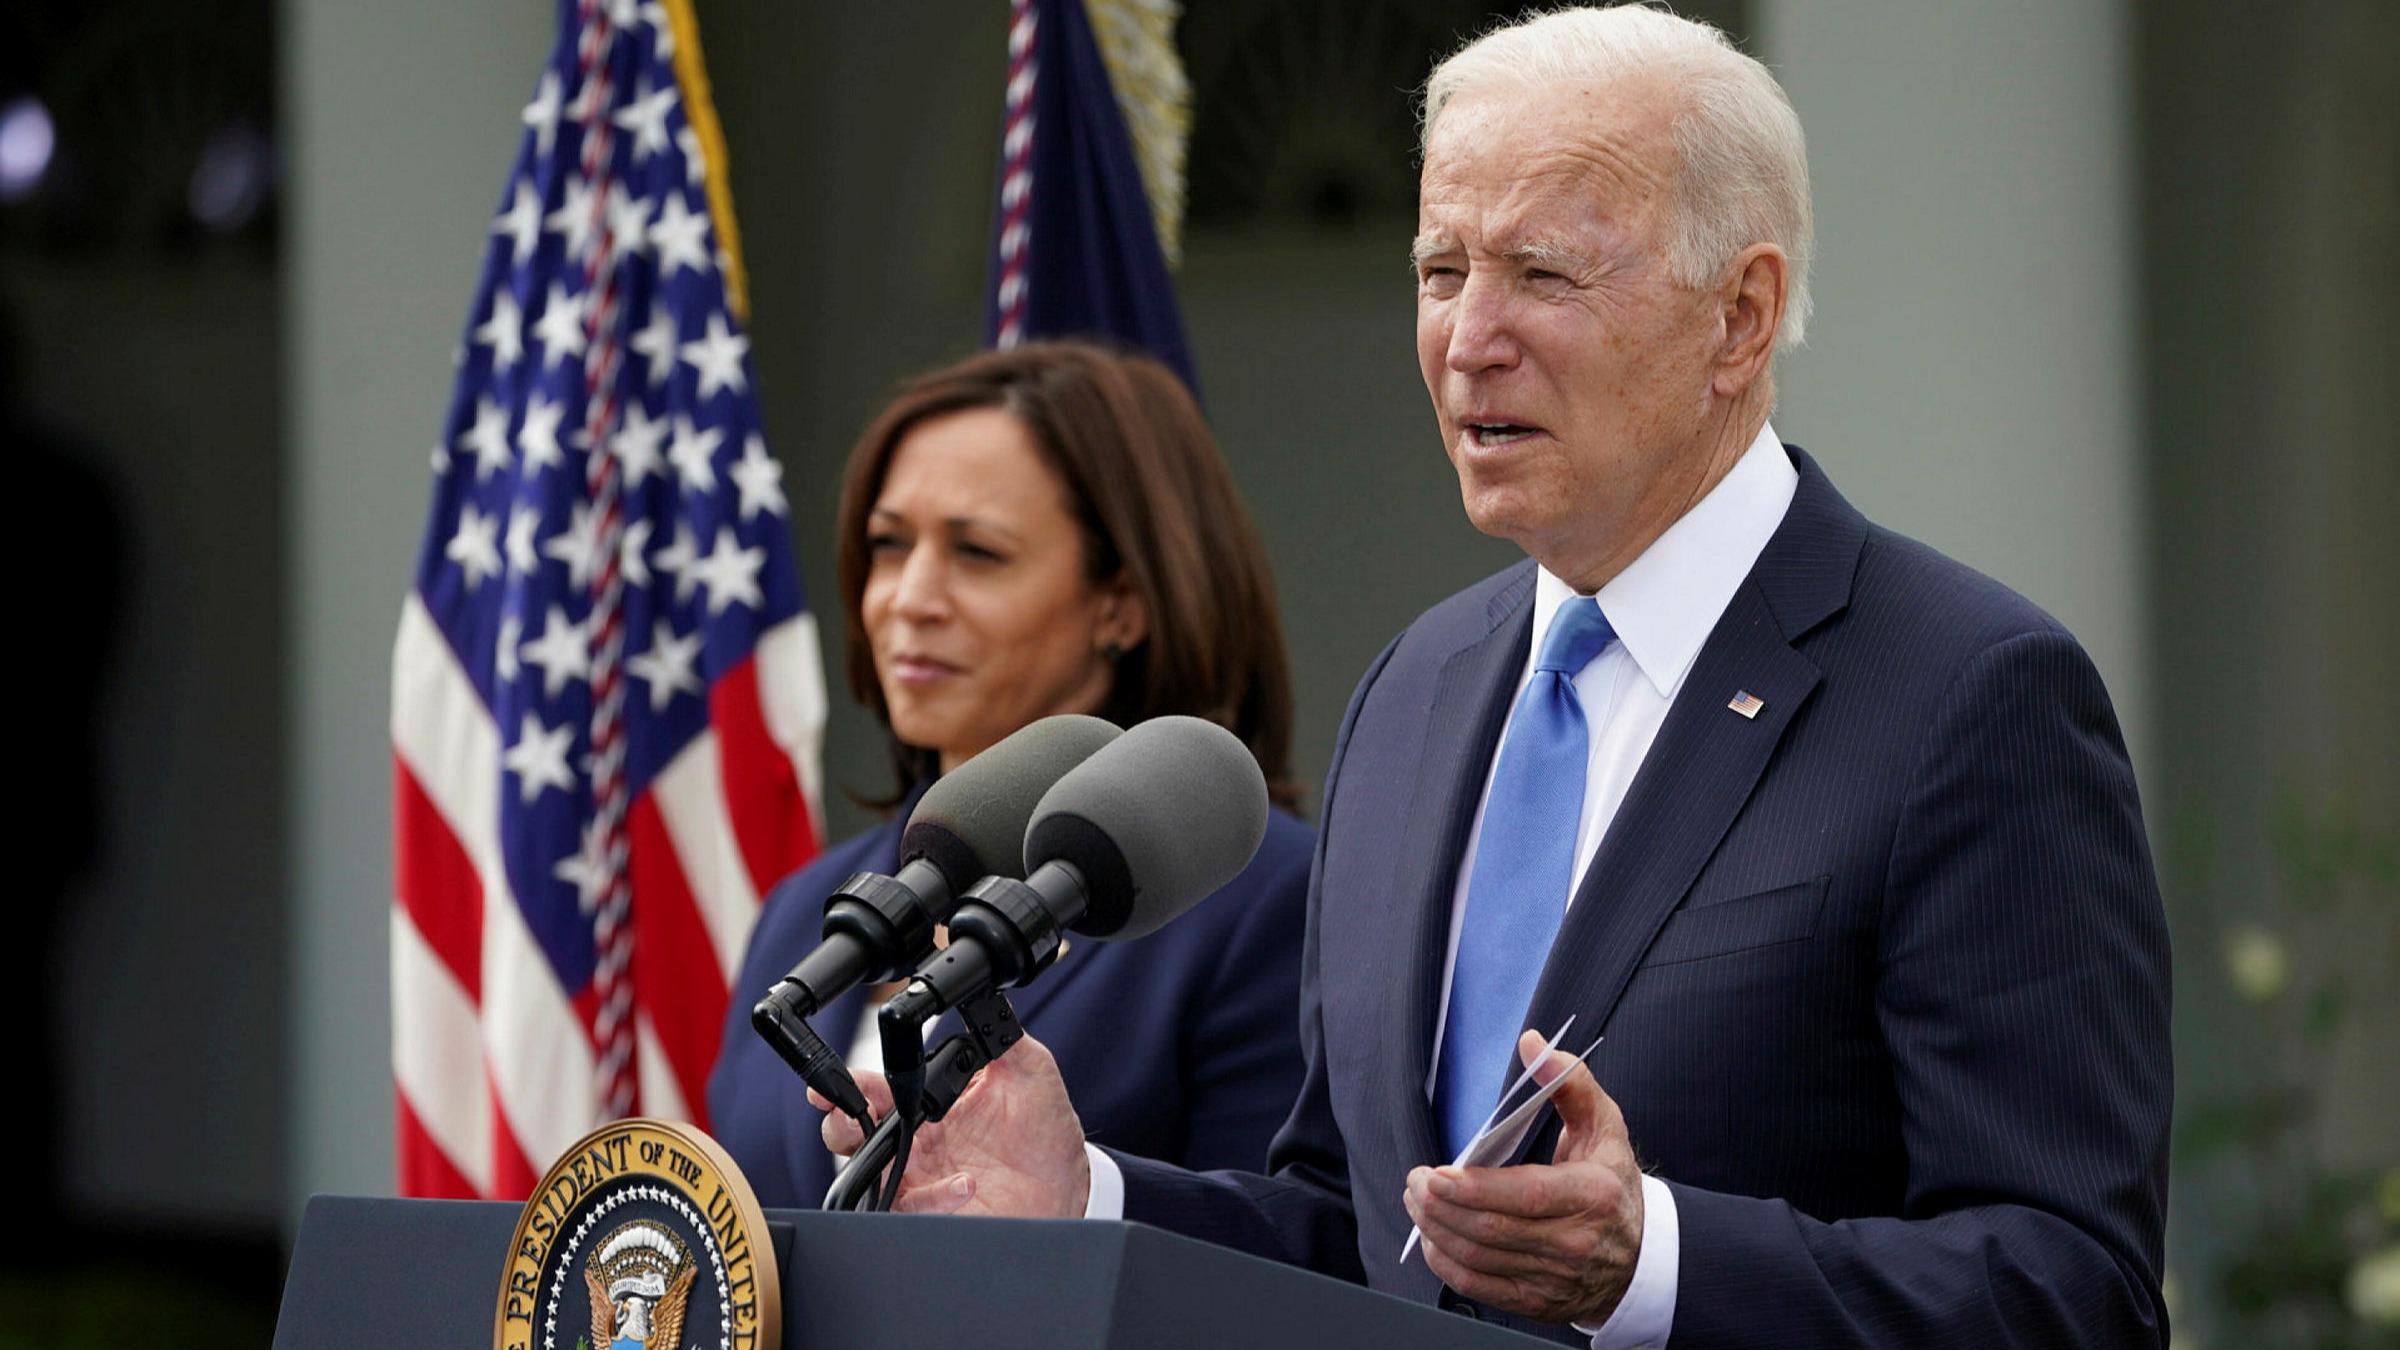 ft.com - James Politi in Washington - Biden faces tough path to US economic recovery